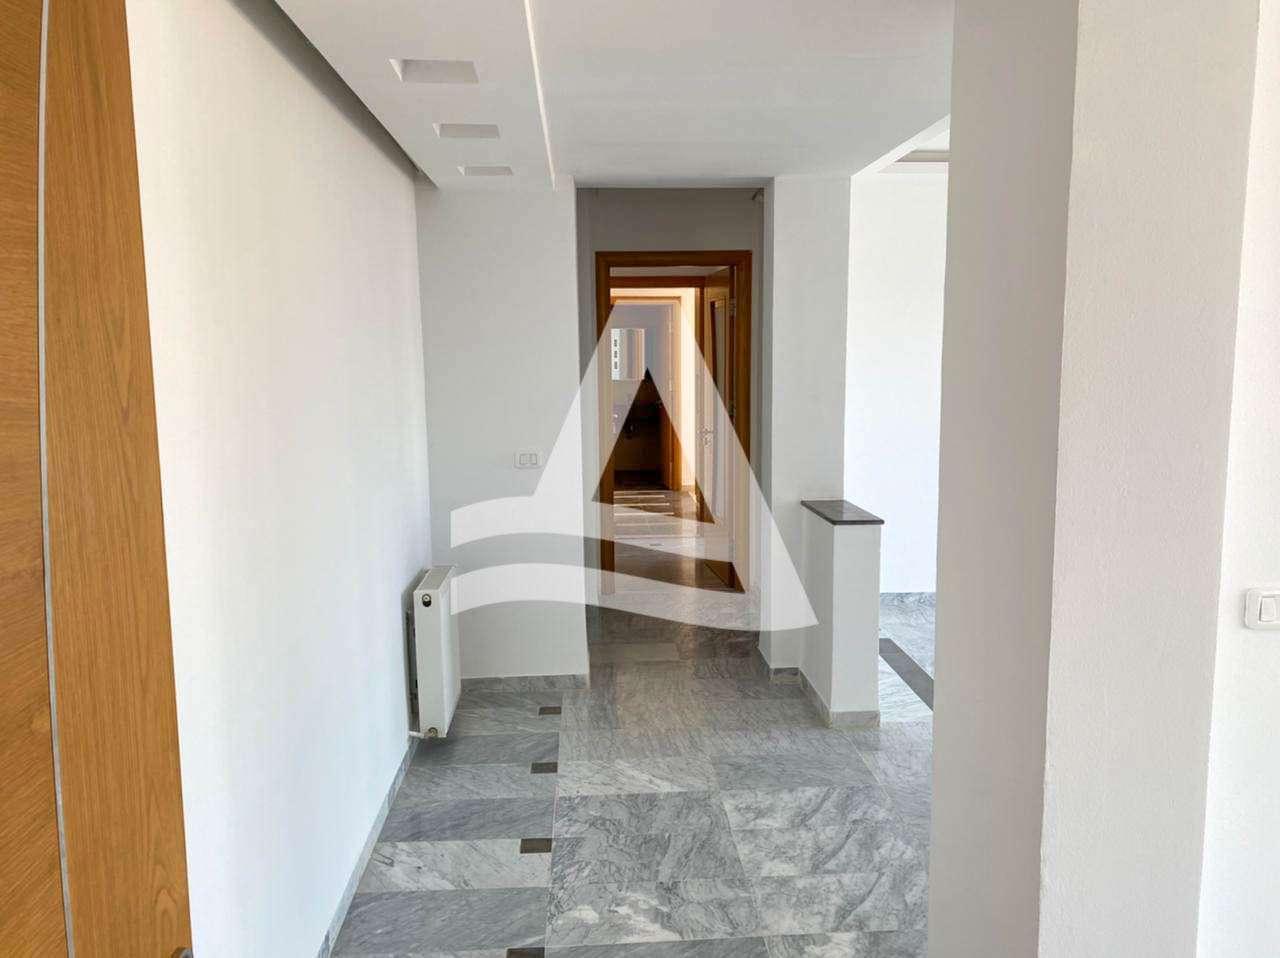 httpss3.amazonaws.comlogimoaws806507321614079424appartement_jardin_de_carthage_1_sur_8